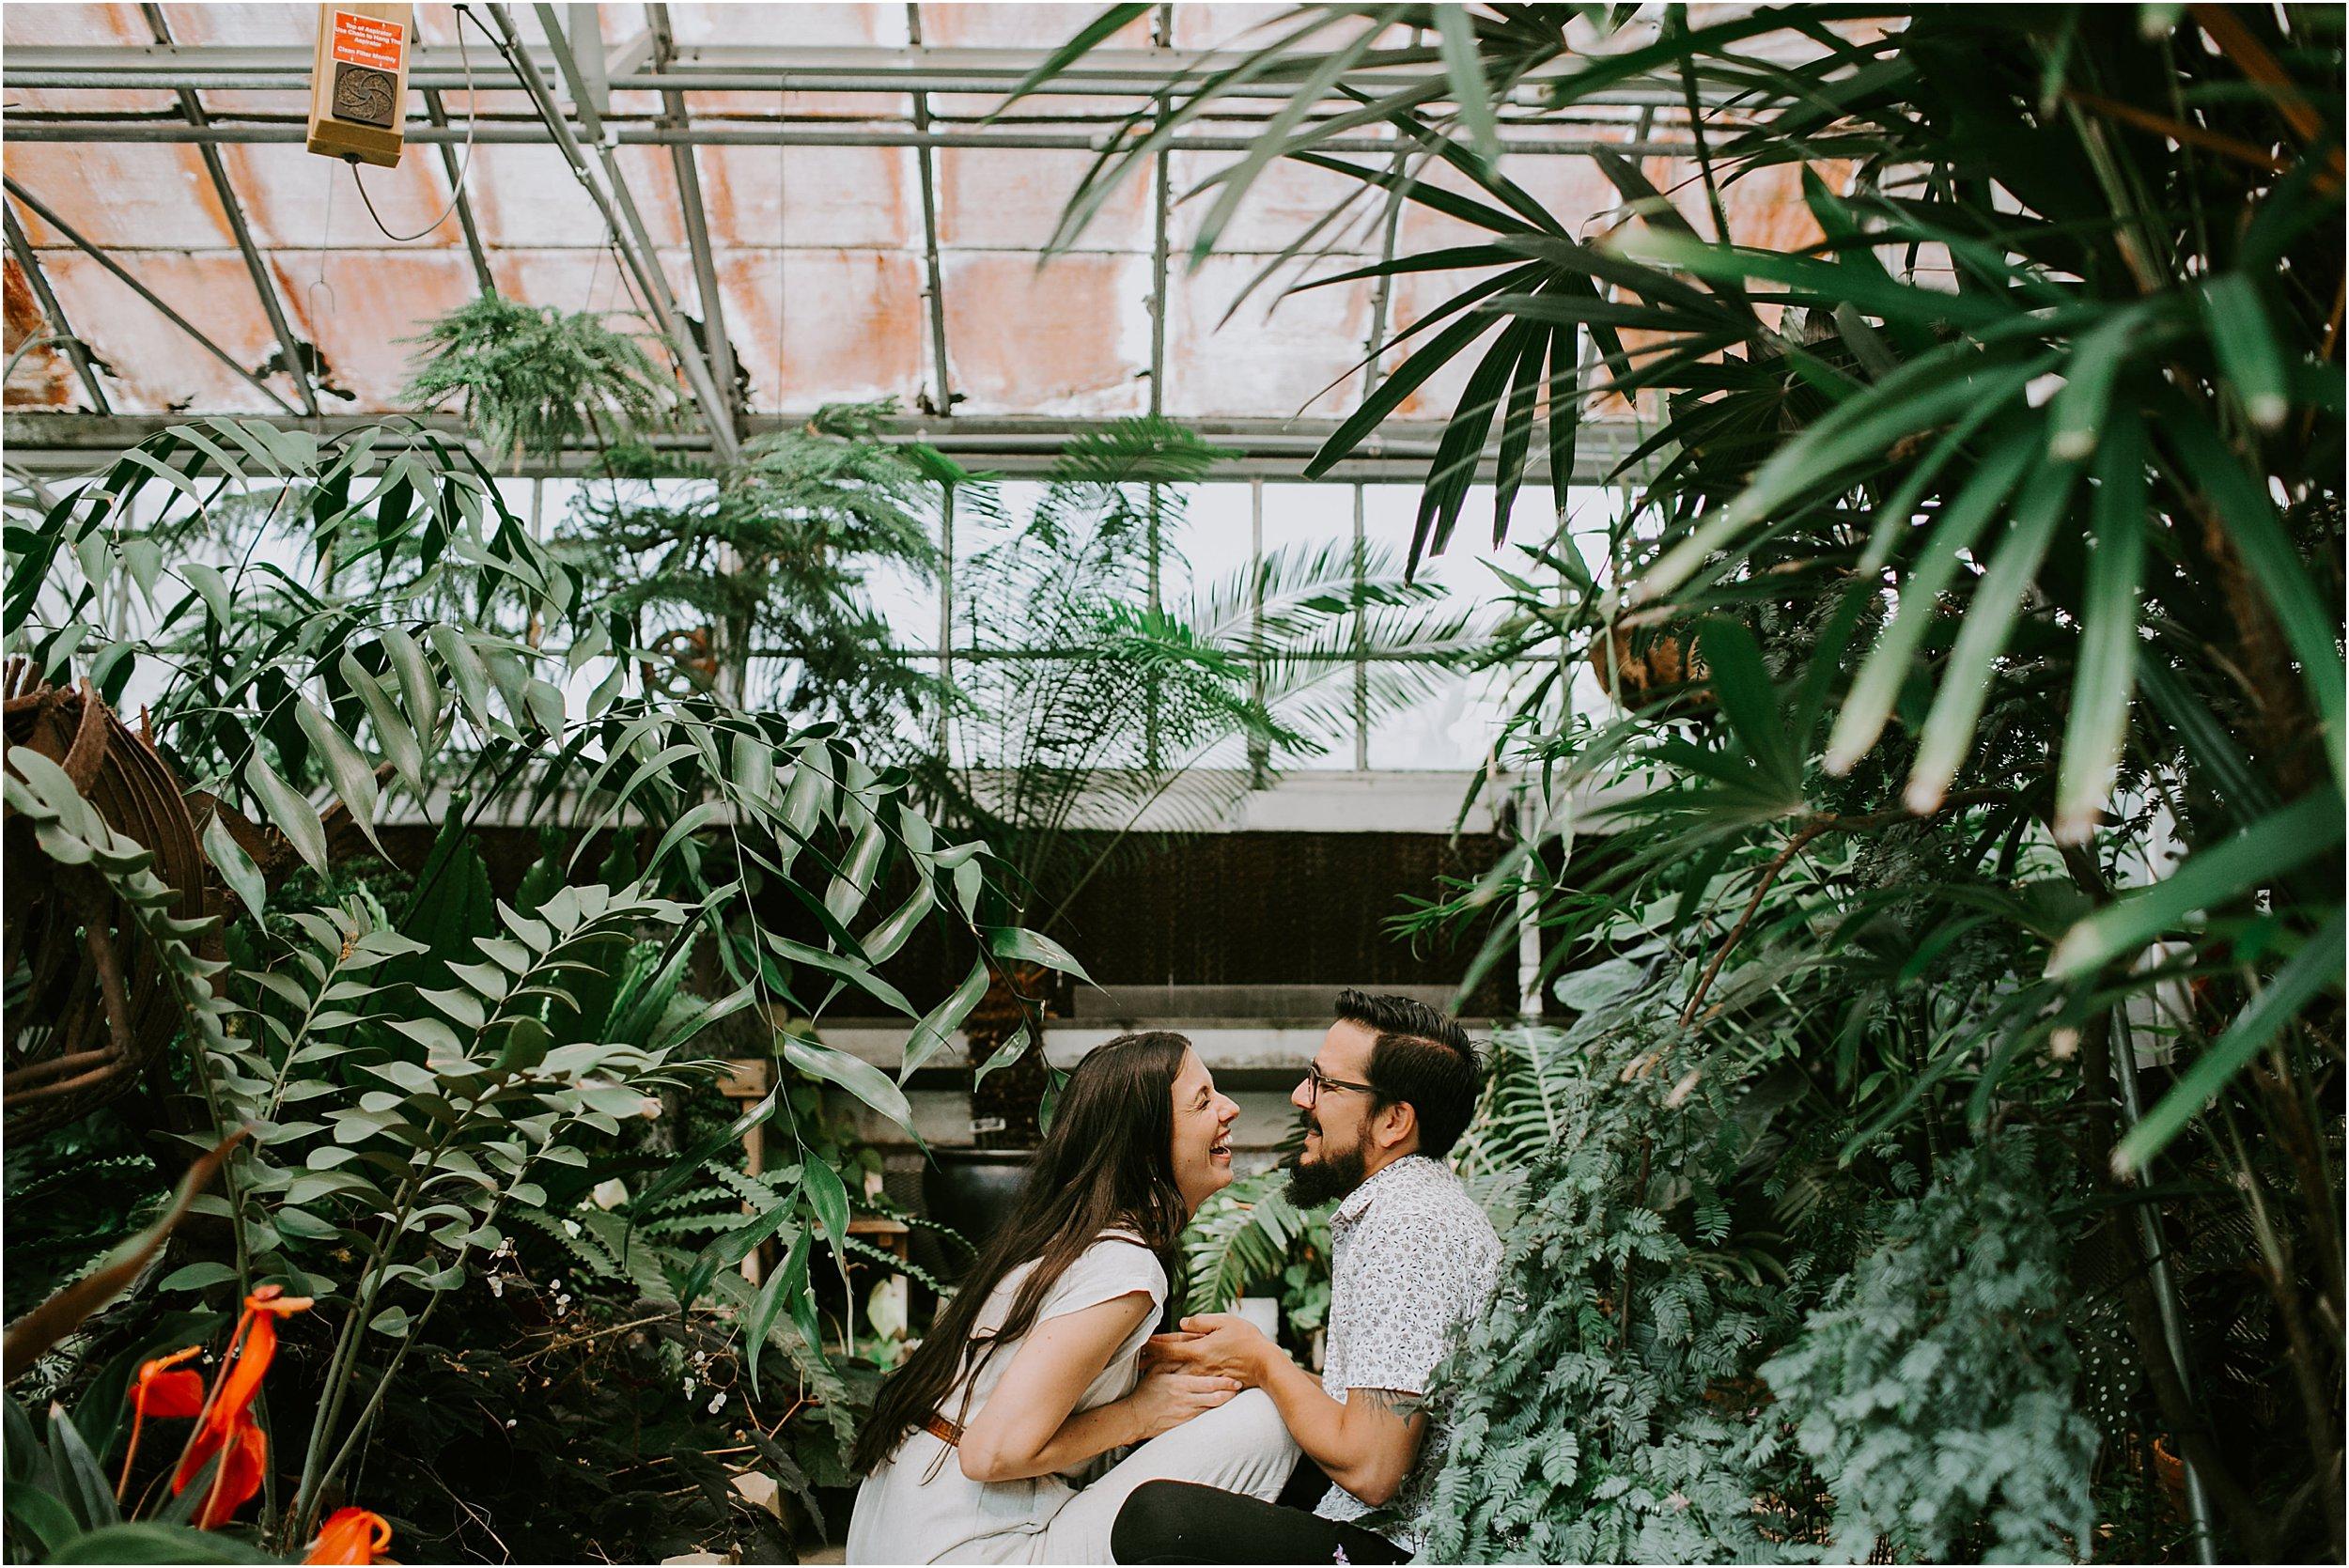 Greenhouse-Adventure-Session_015.jpg